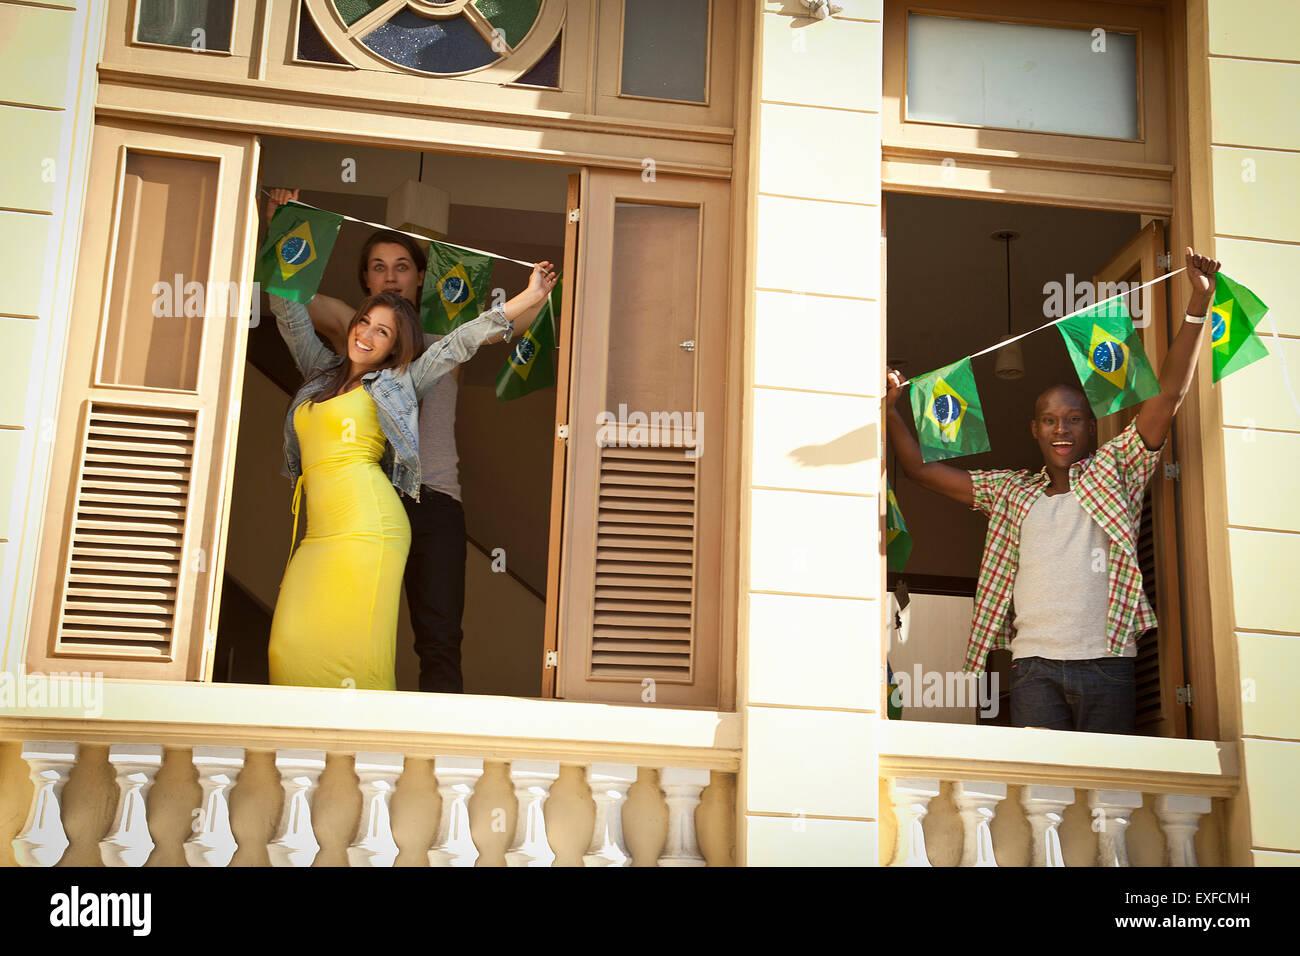 Students celebrating with Brazilian flags, Rio de Janeiro, Brazil - Stock Image